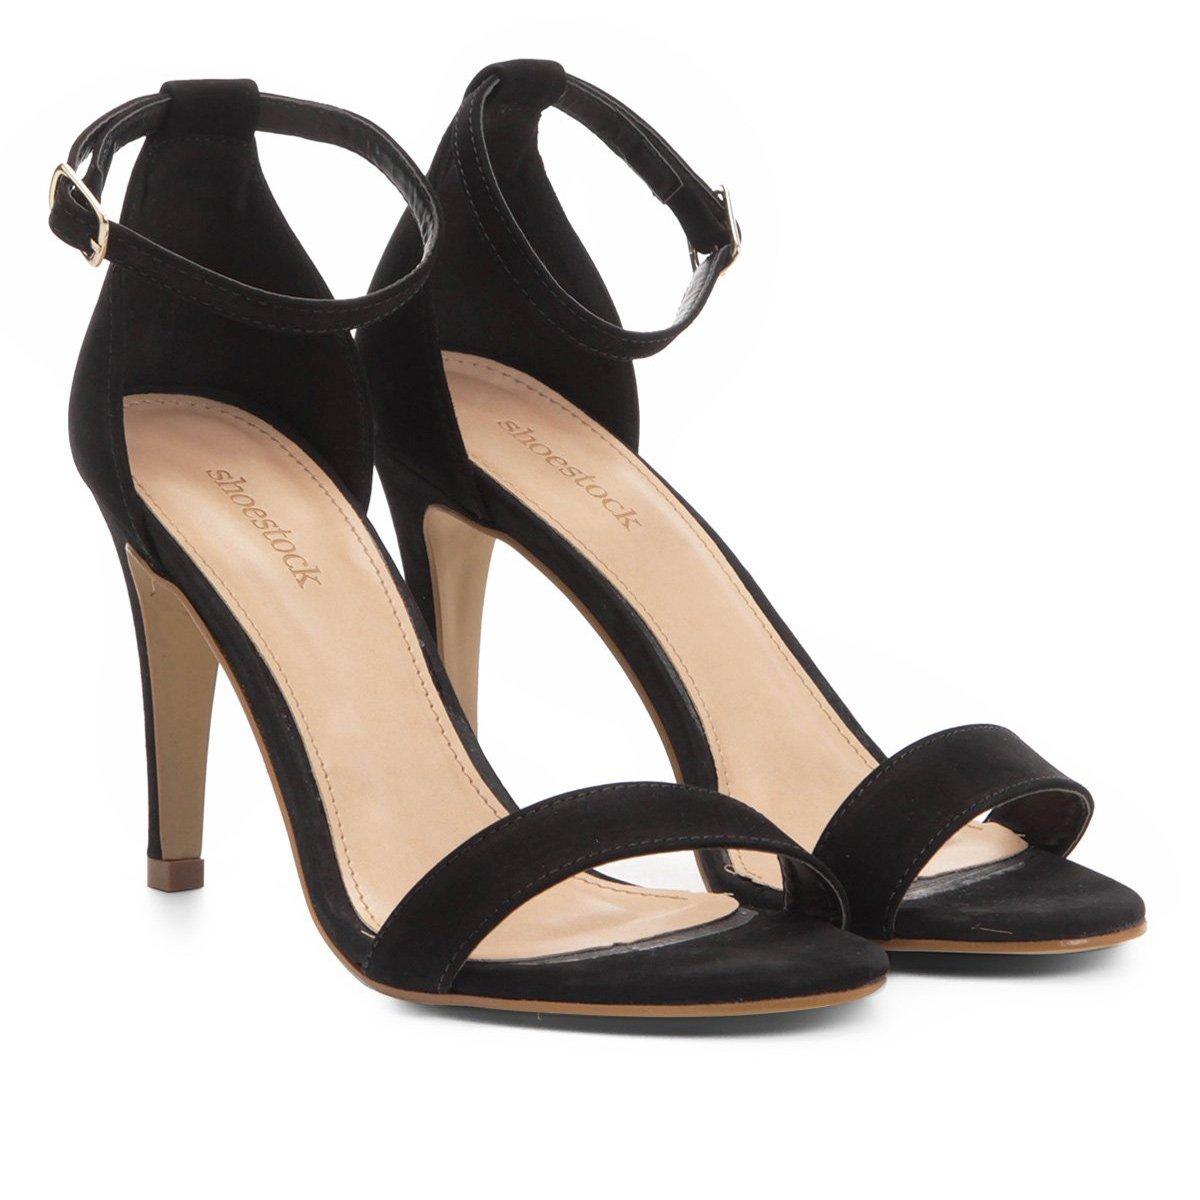 8c56116fff Sandália Shoestock Salto Fino Naked Feminina